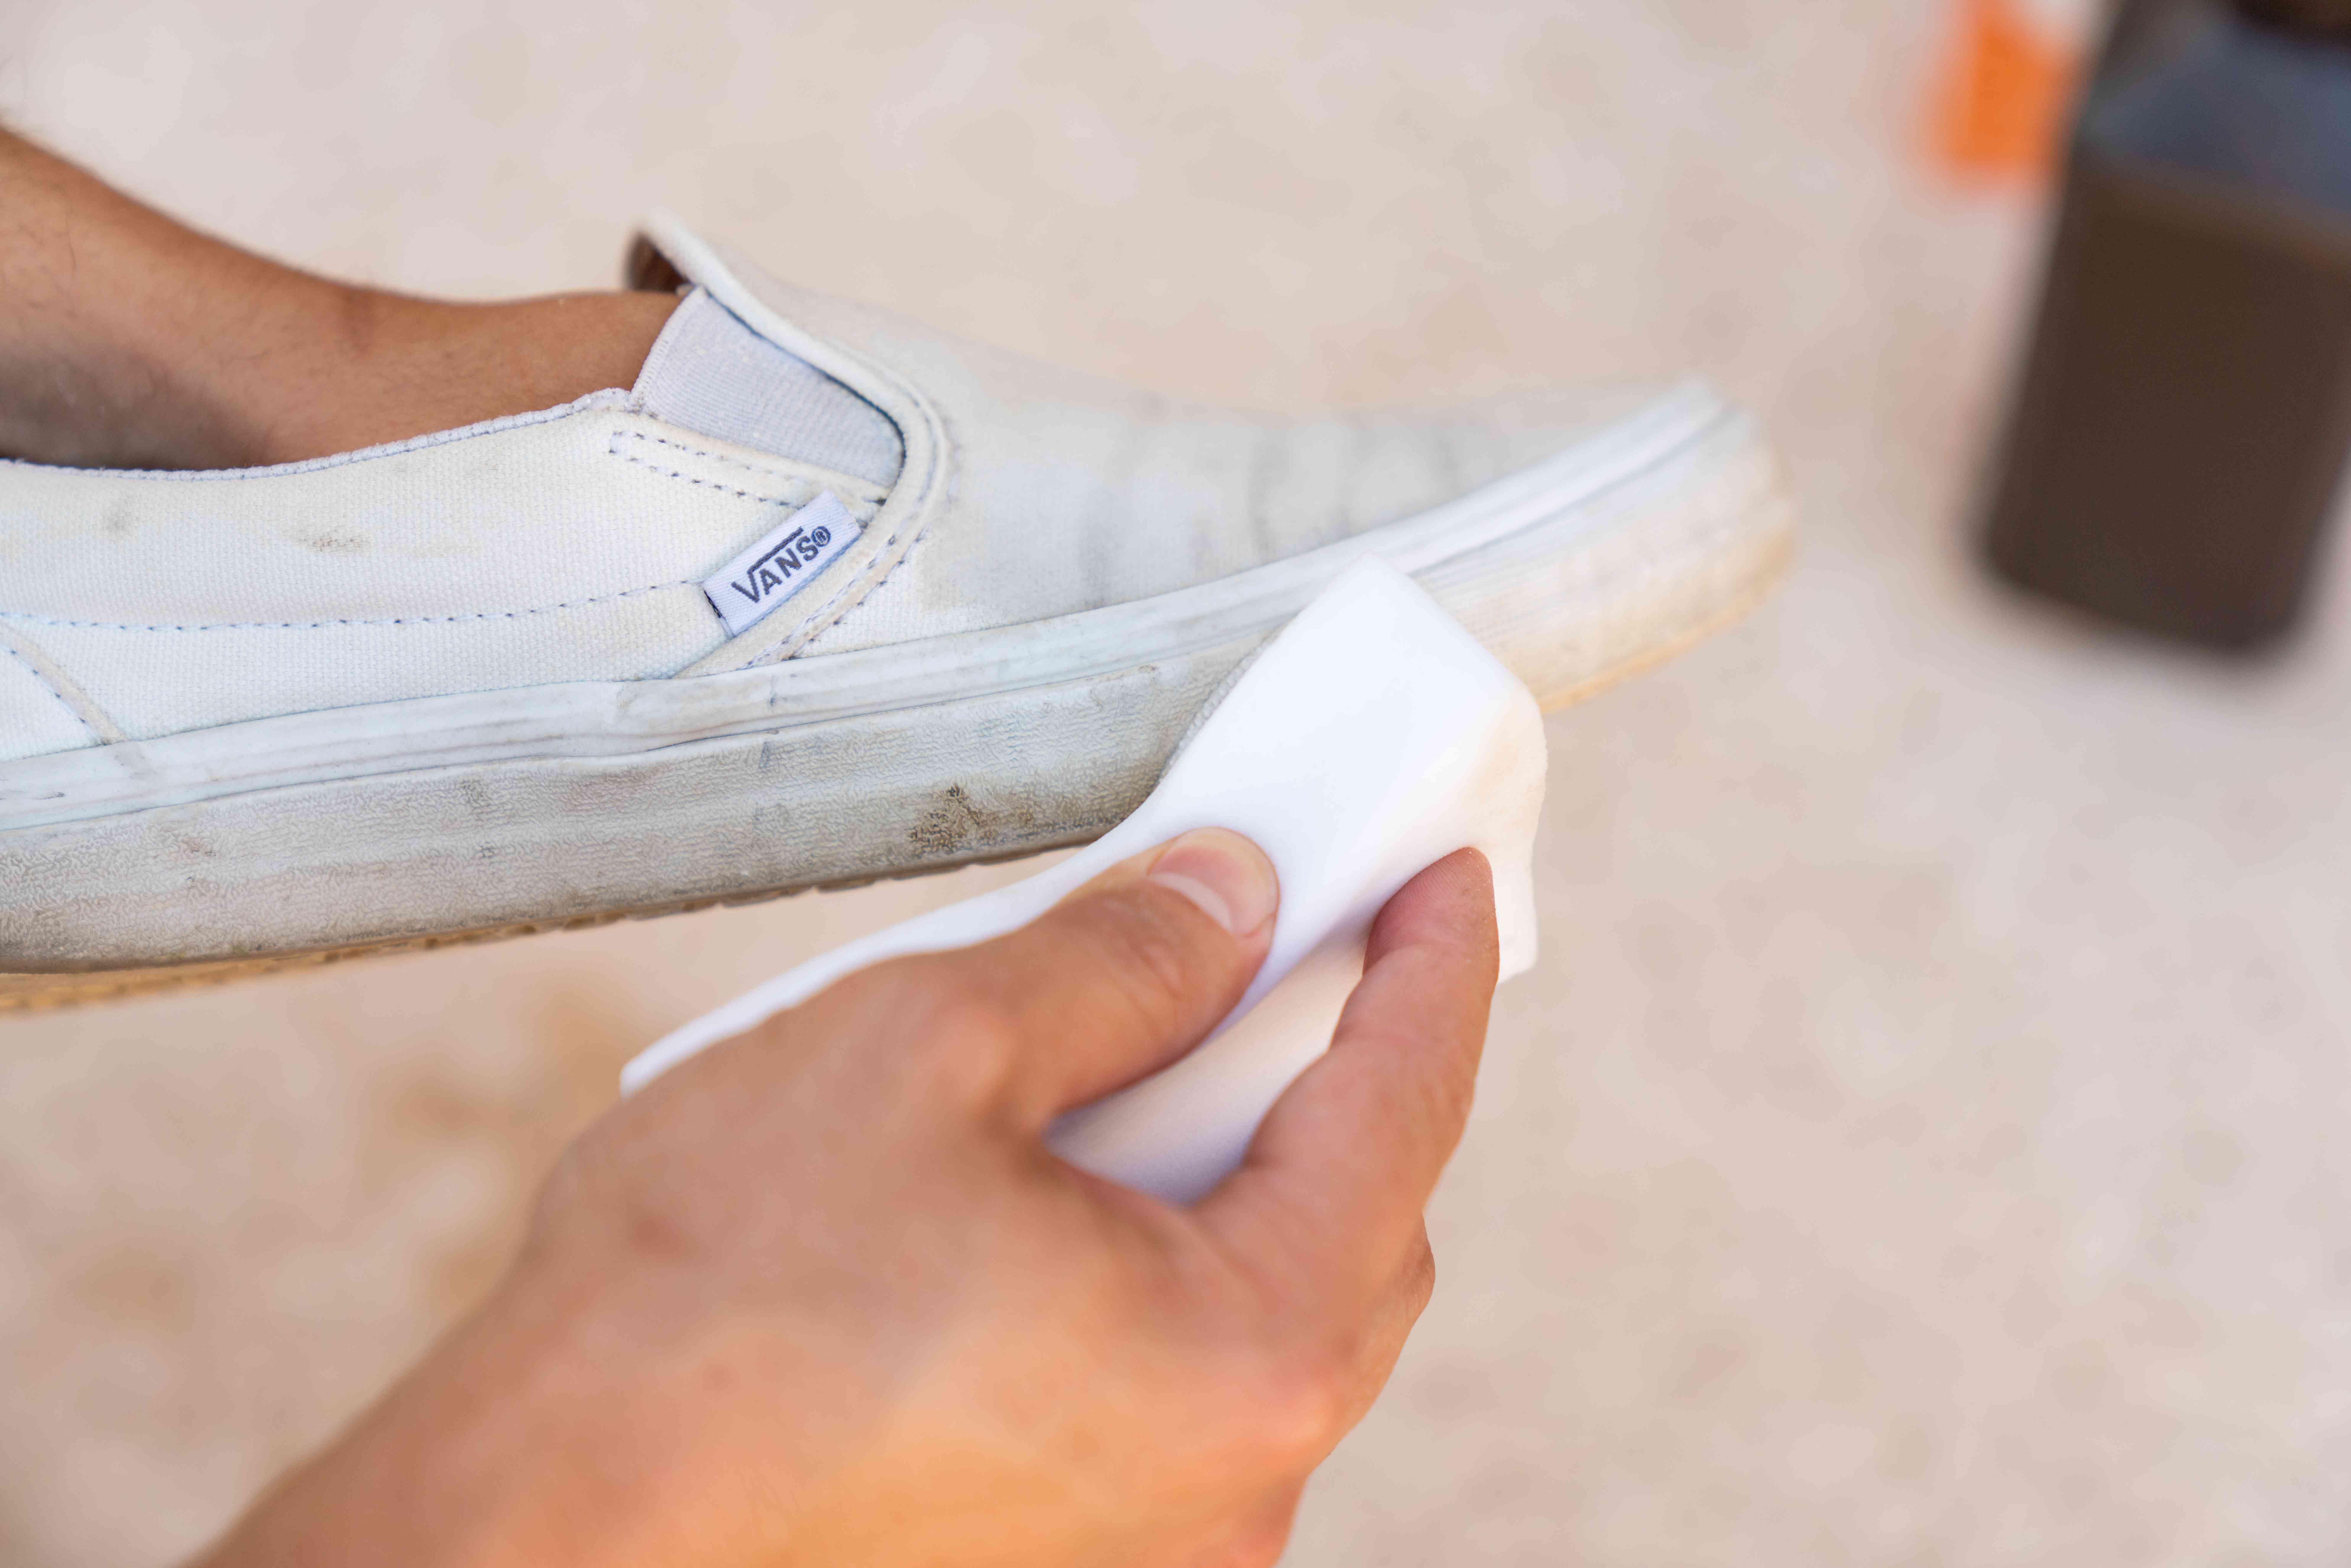 Dirty white van's rubber soles scrubbed by melamine sponge